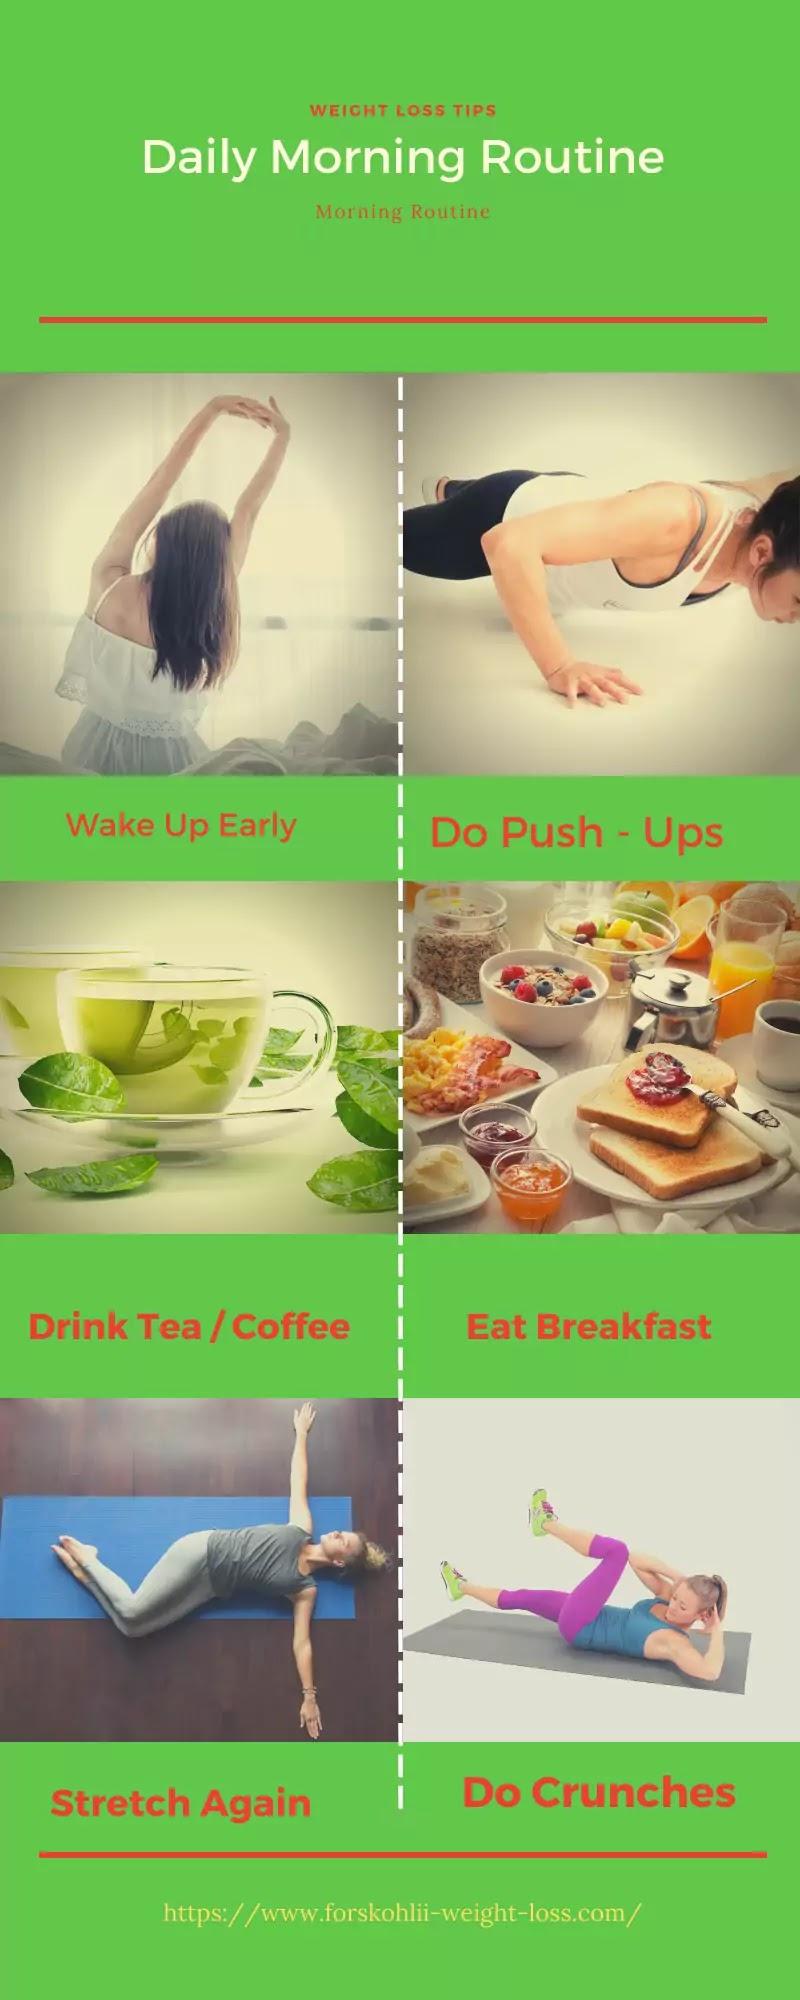 Fat lose tips